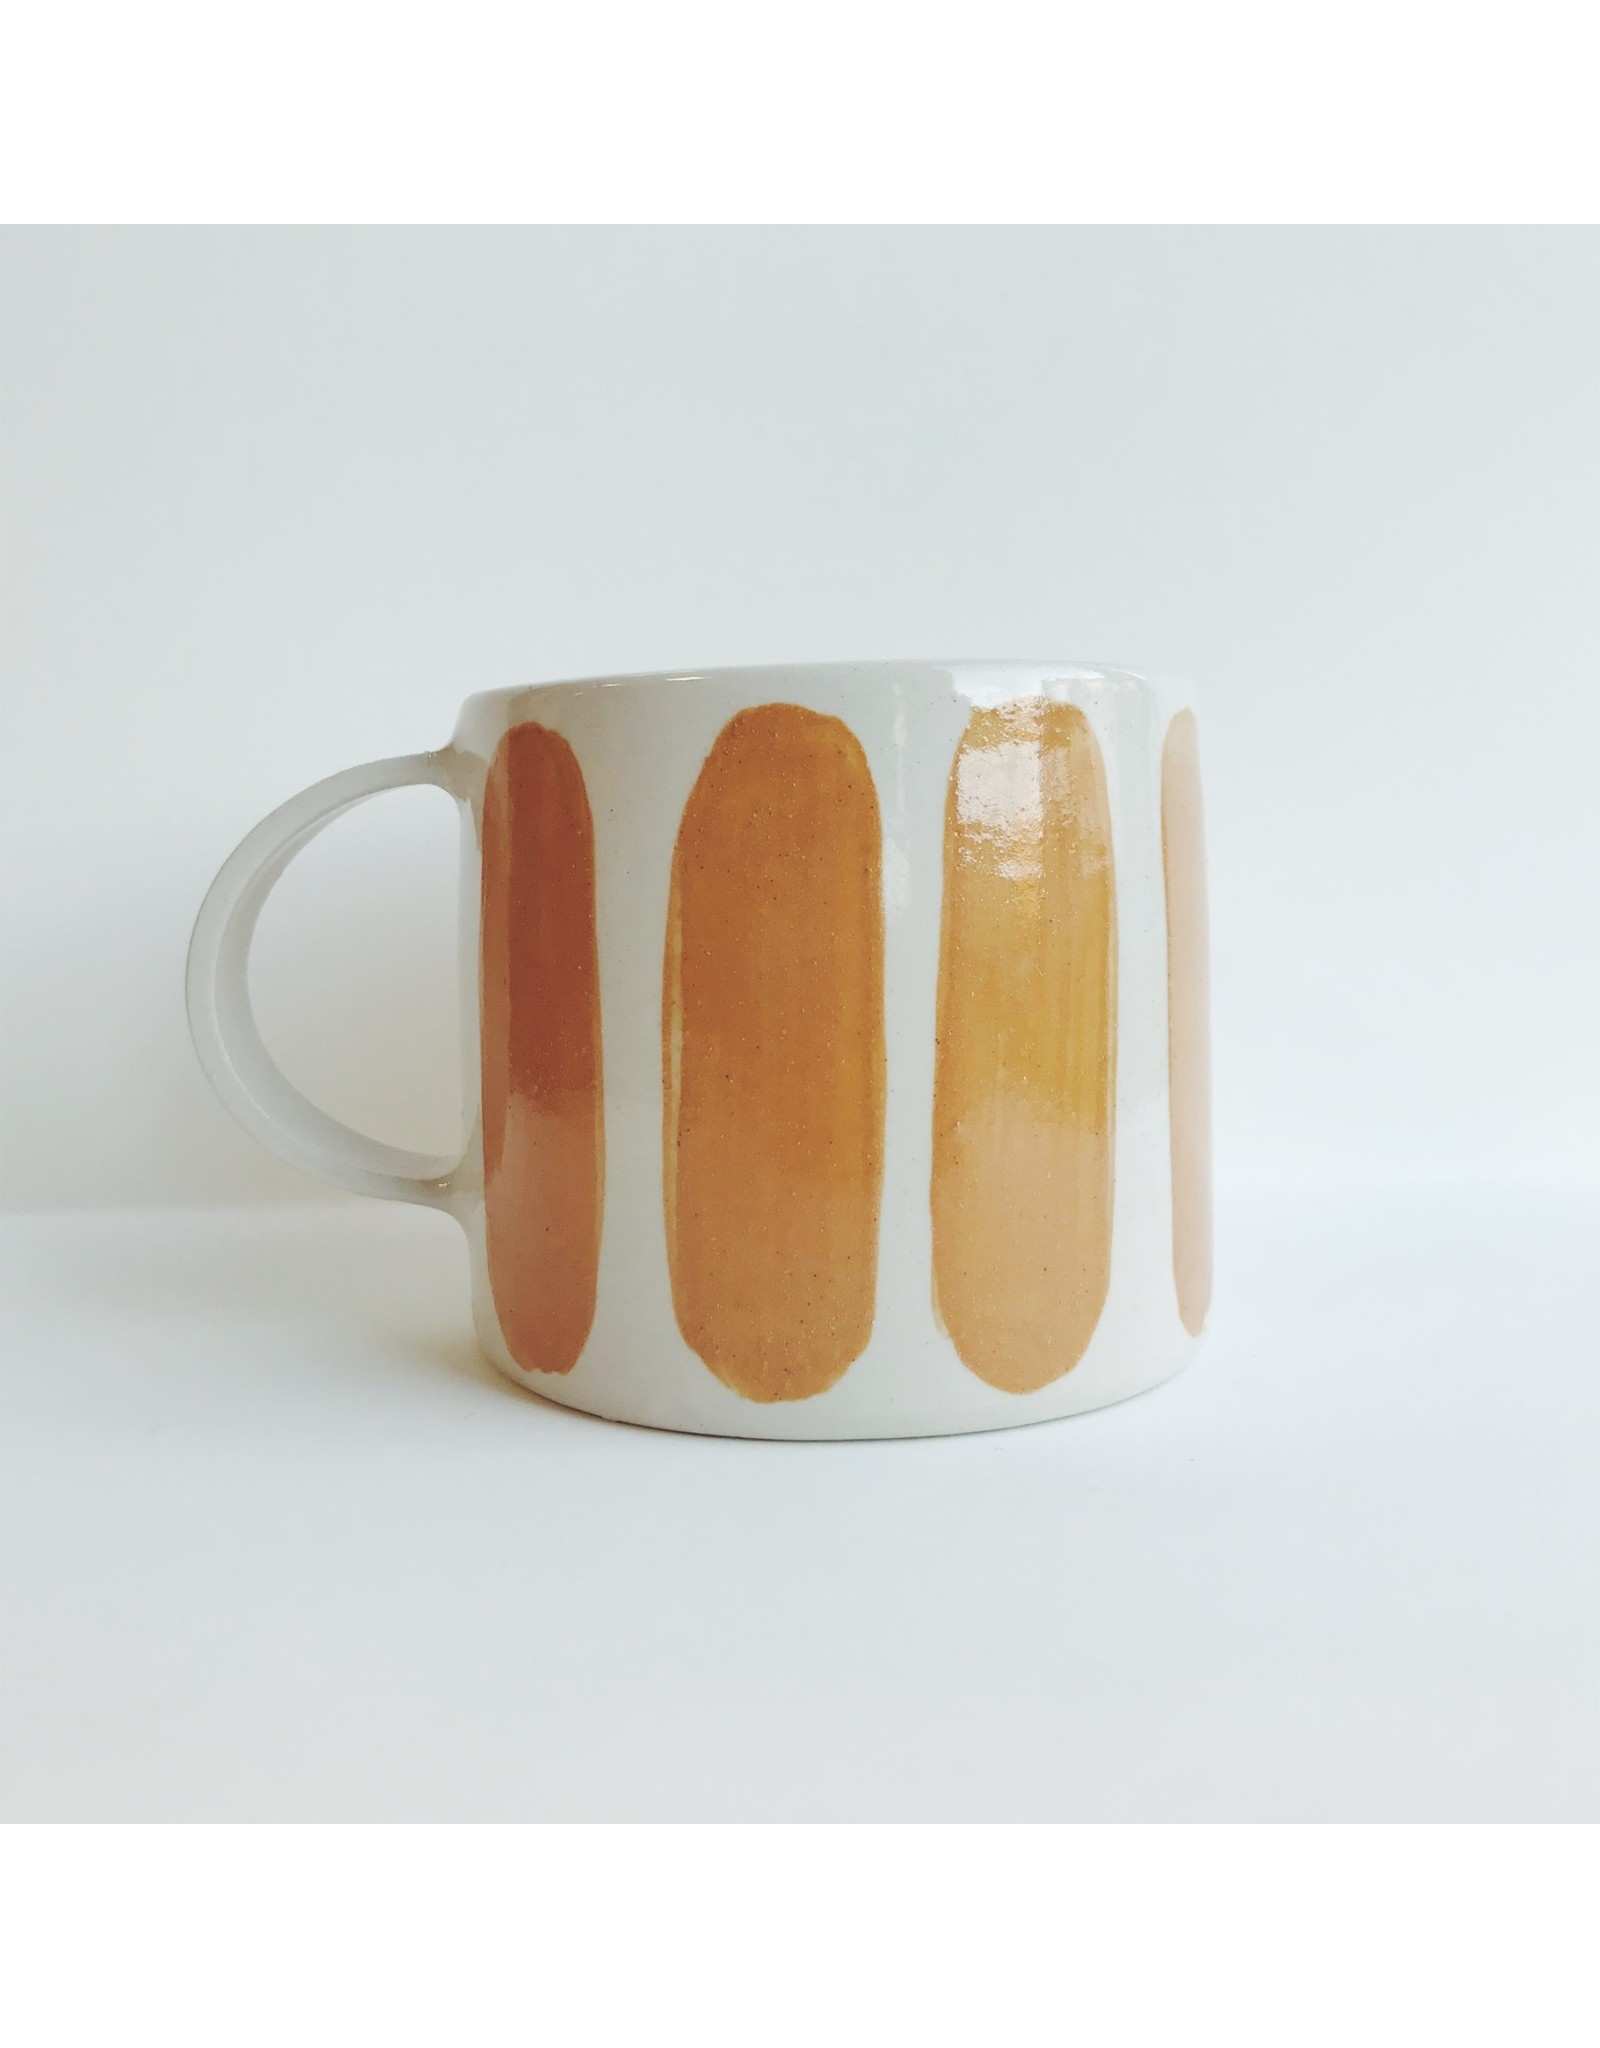 Striped Handmade Ceramic Mug